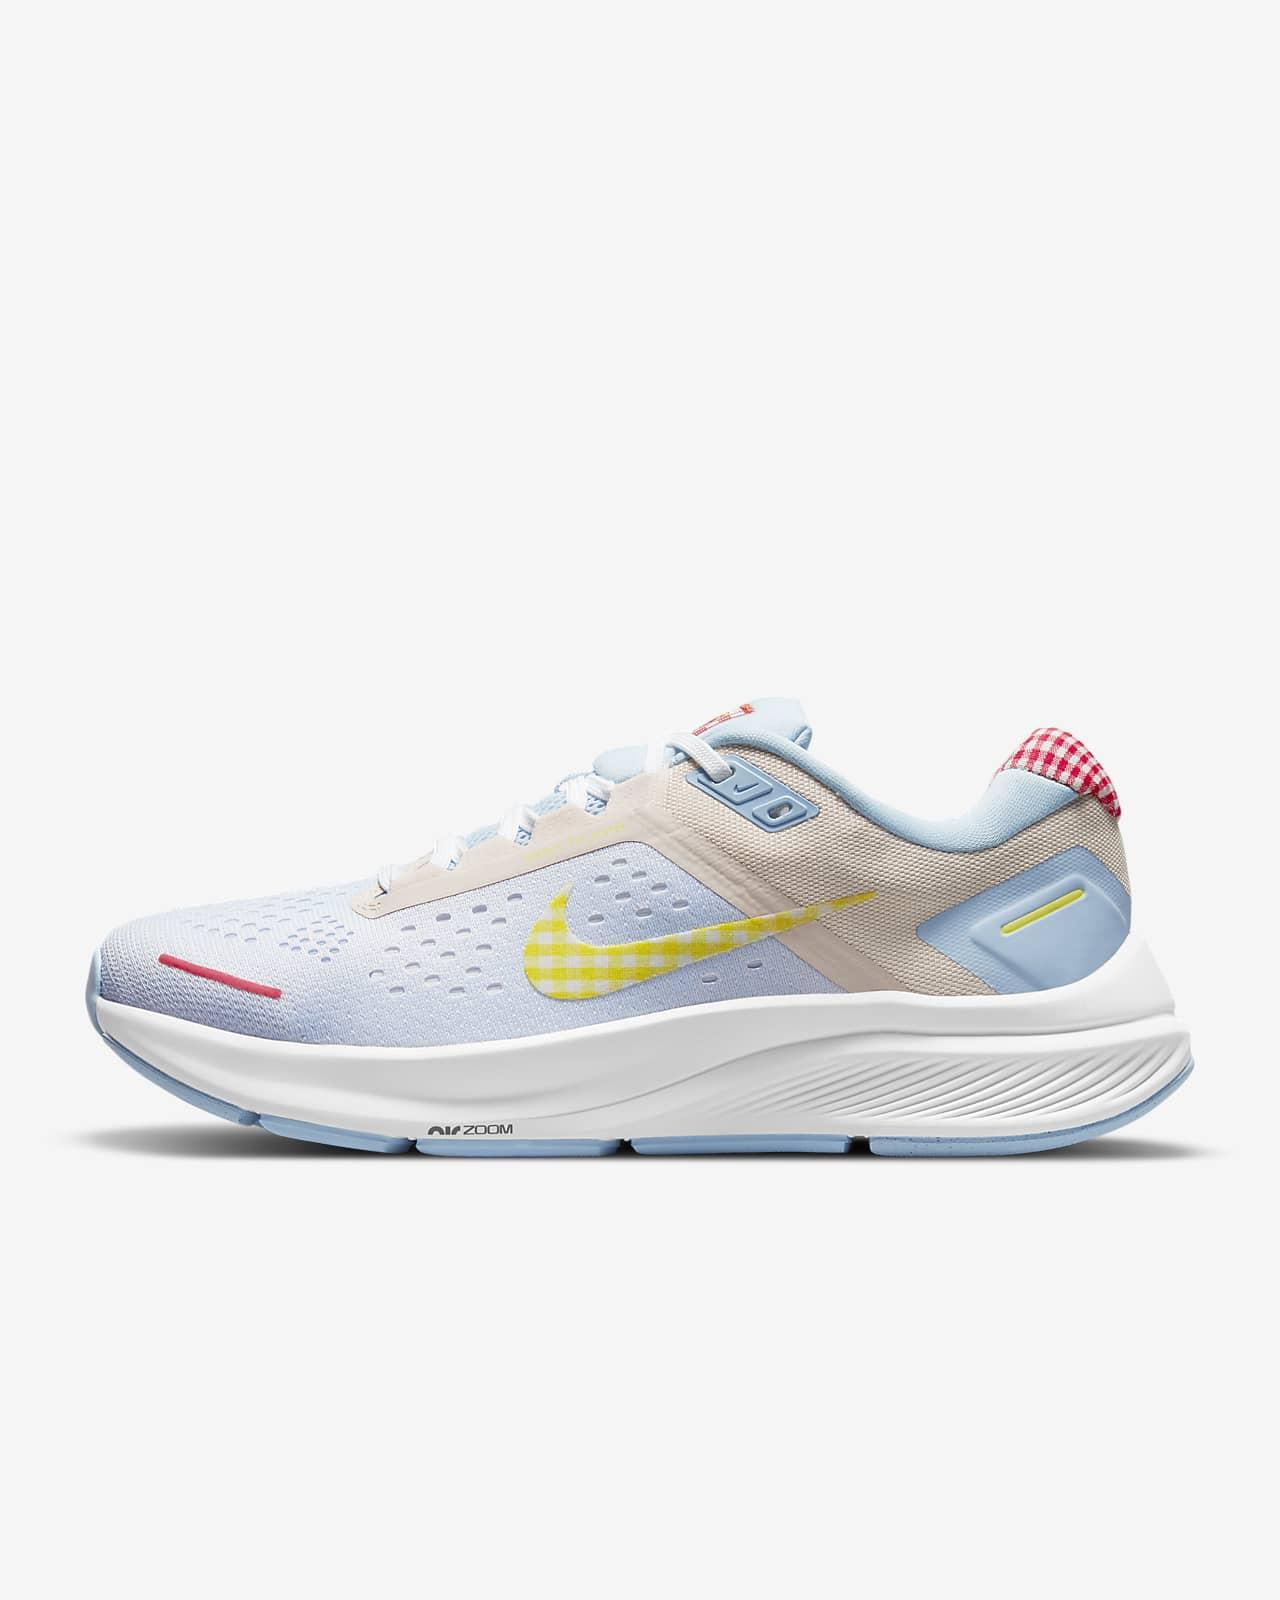 Nike Air Zoom Structure 23 Women's Running Shoe